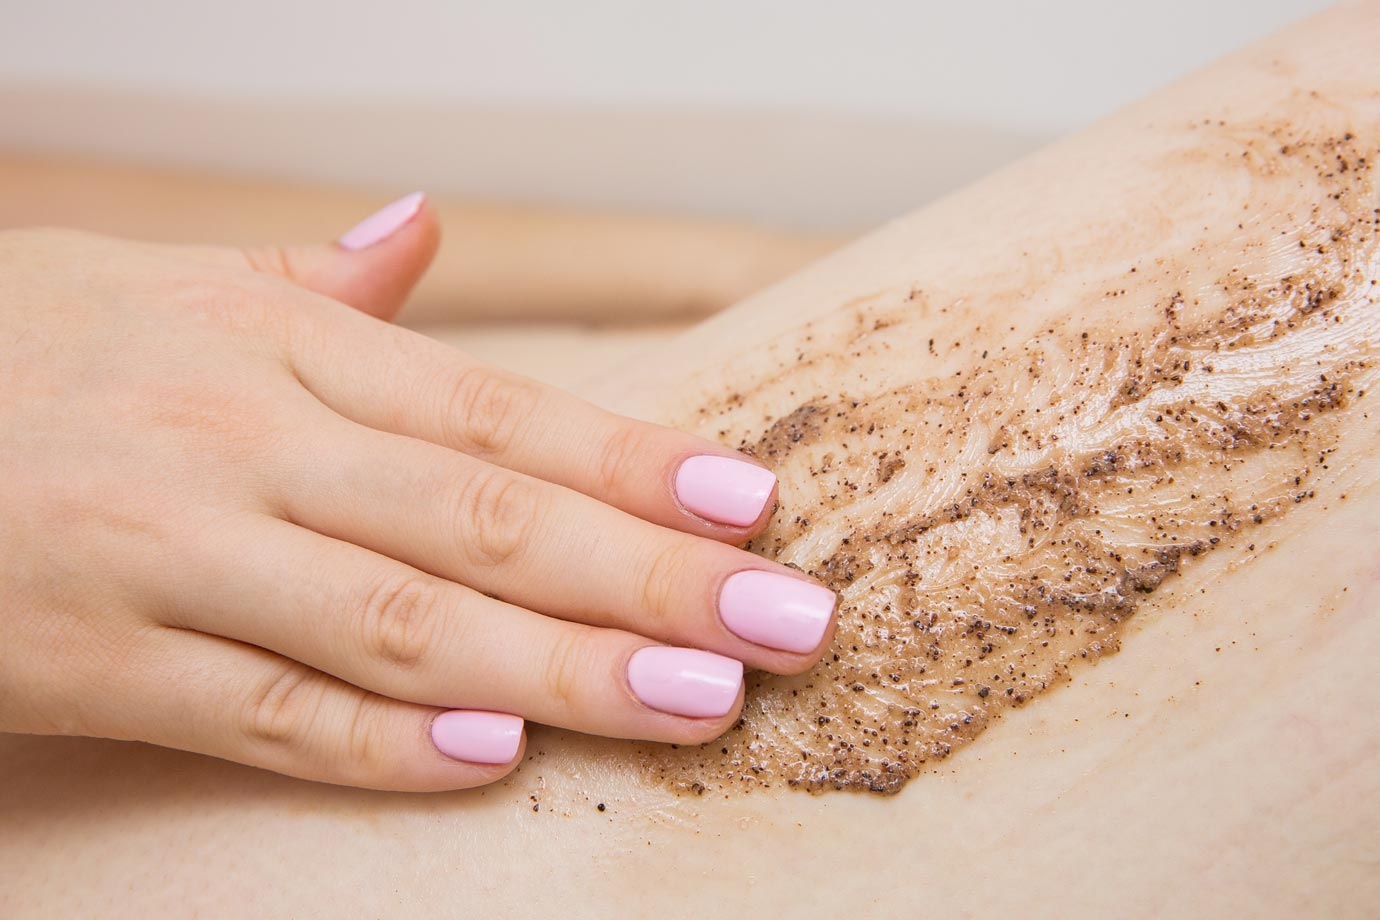 Beneficios de realizar un peeling corporal Albacete | Esther Alcolea centro de estética